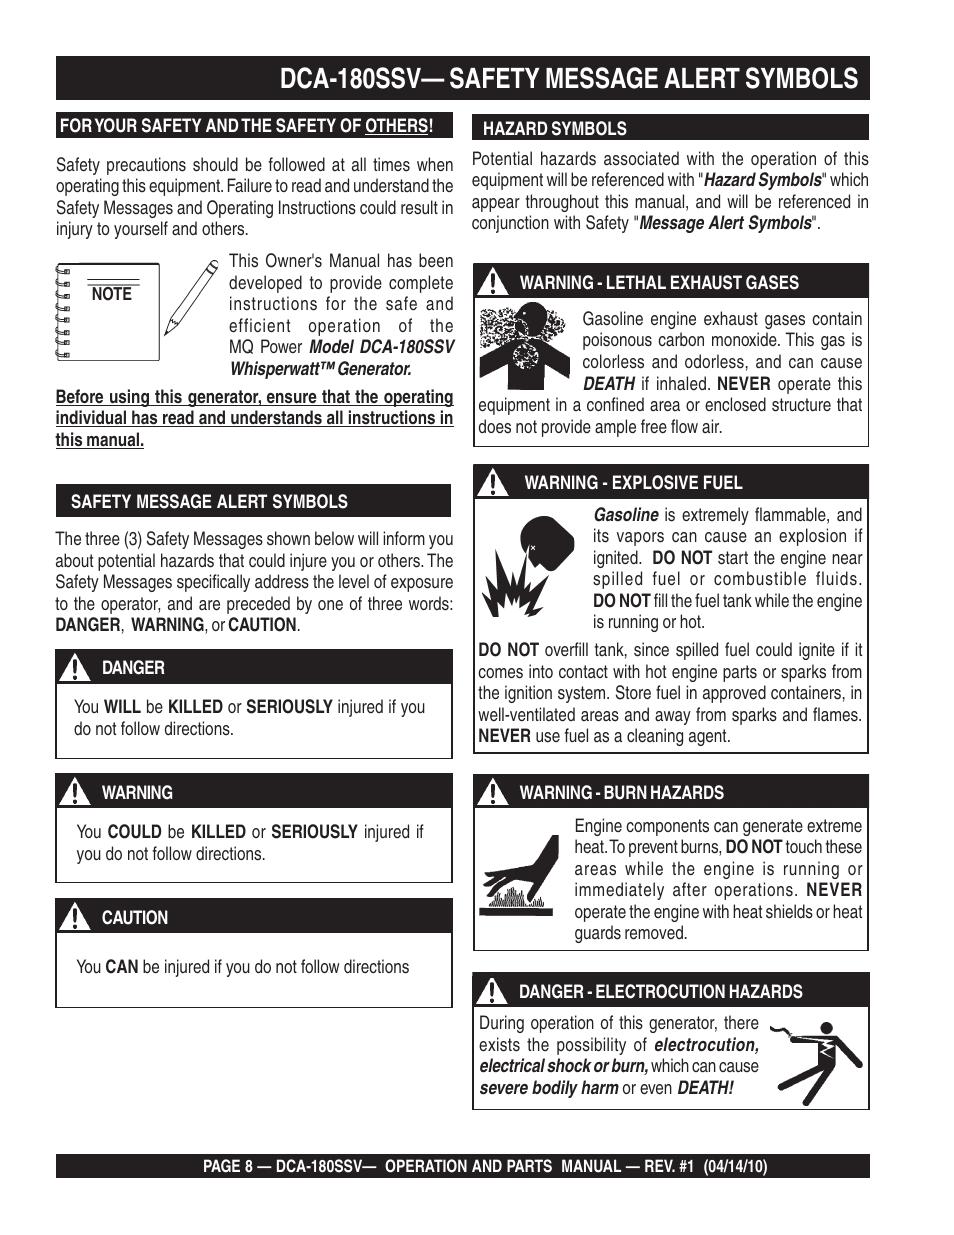 Dca 180ssv Safety Message Alert Symbols Multiquip Mq Power